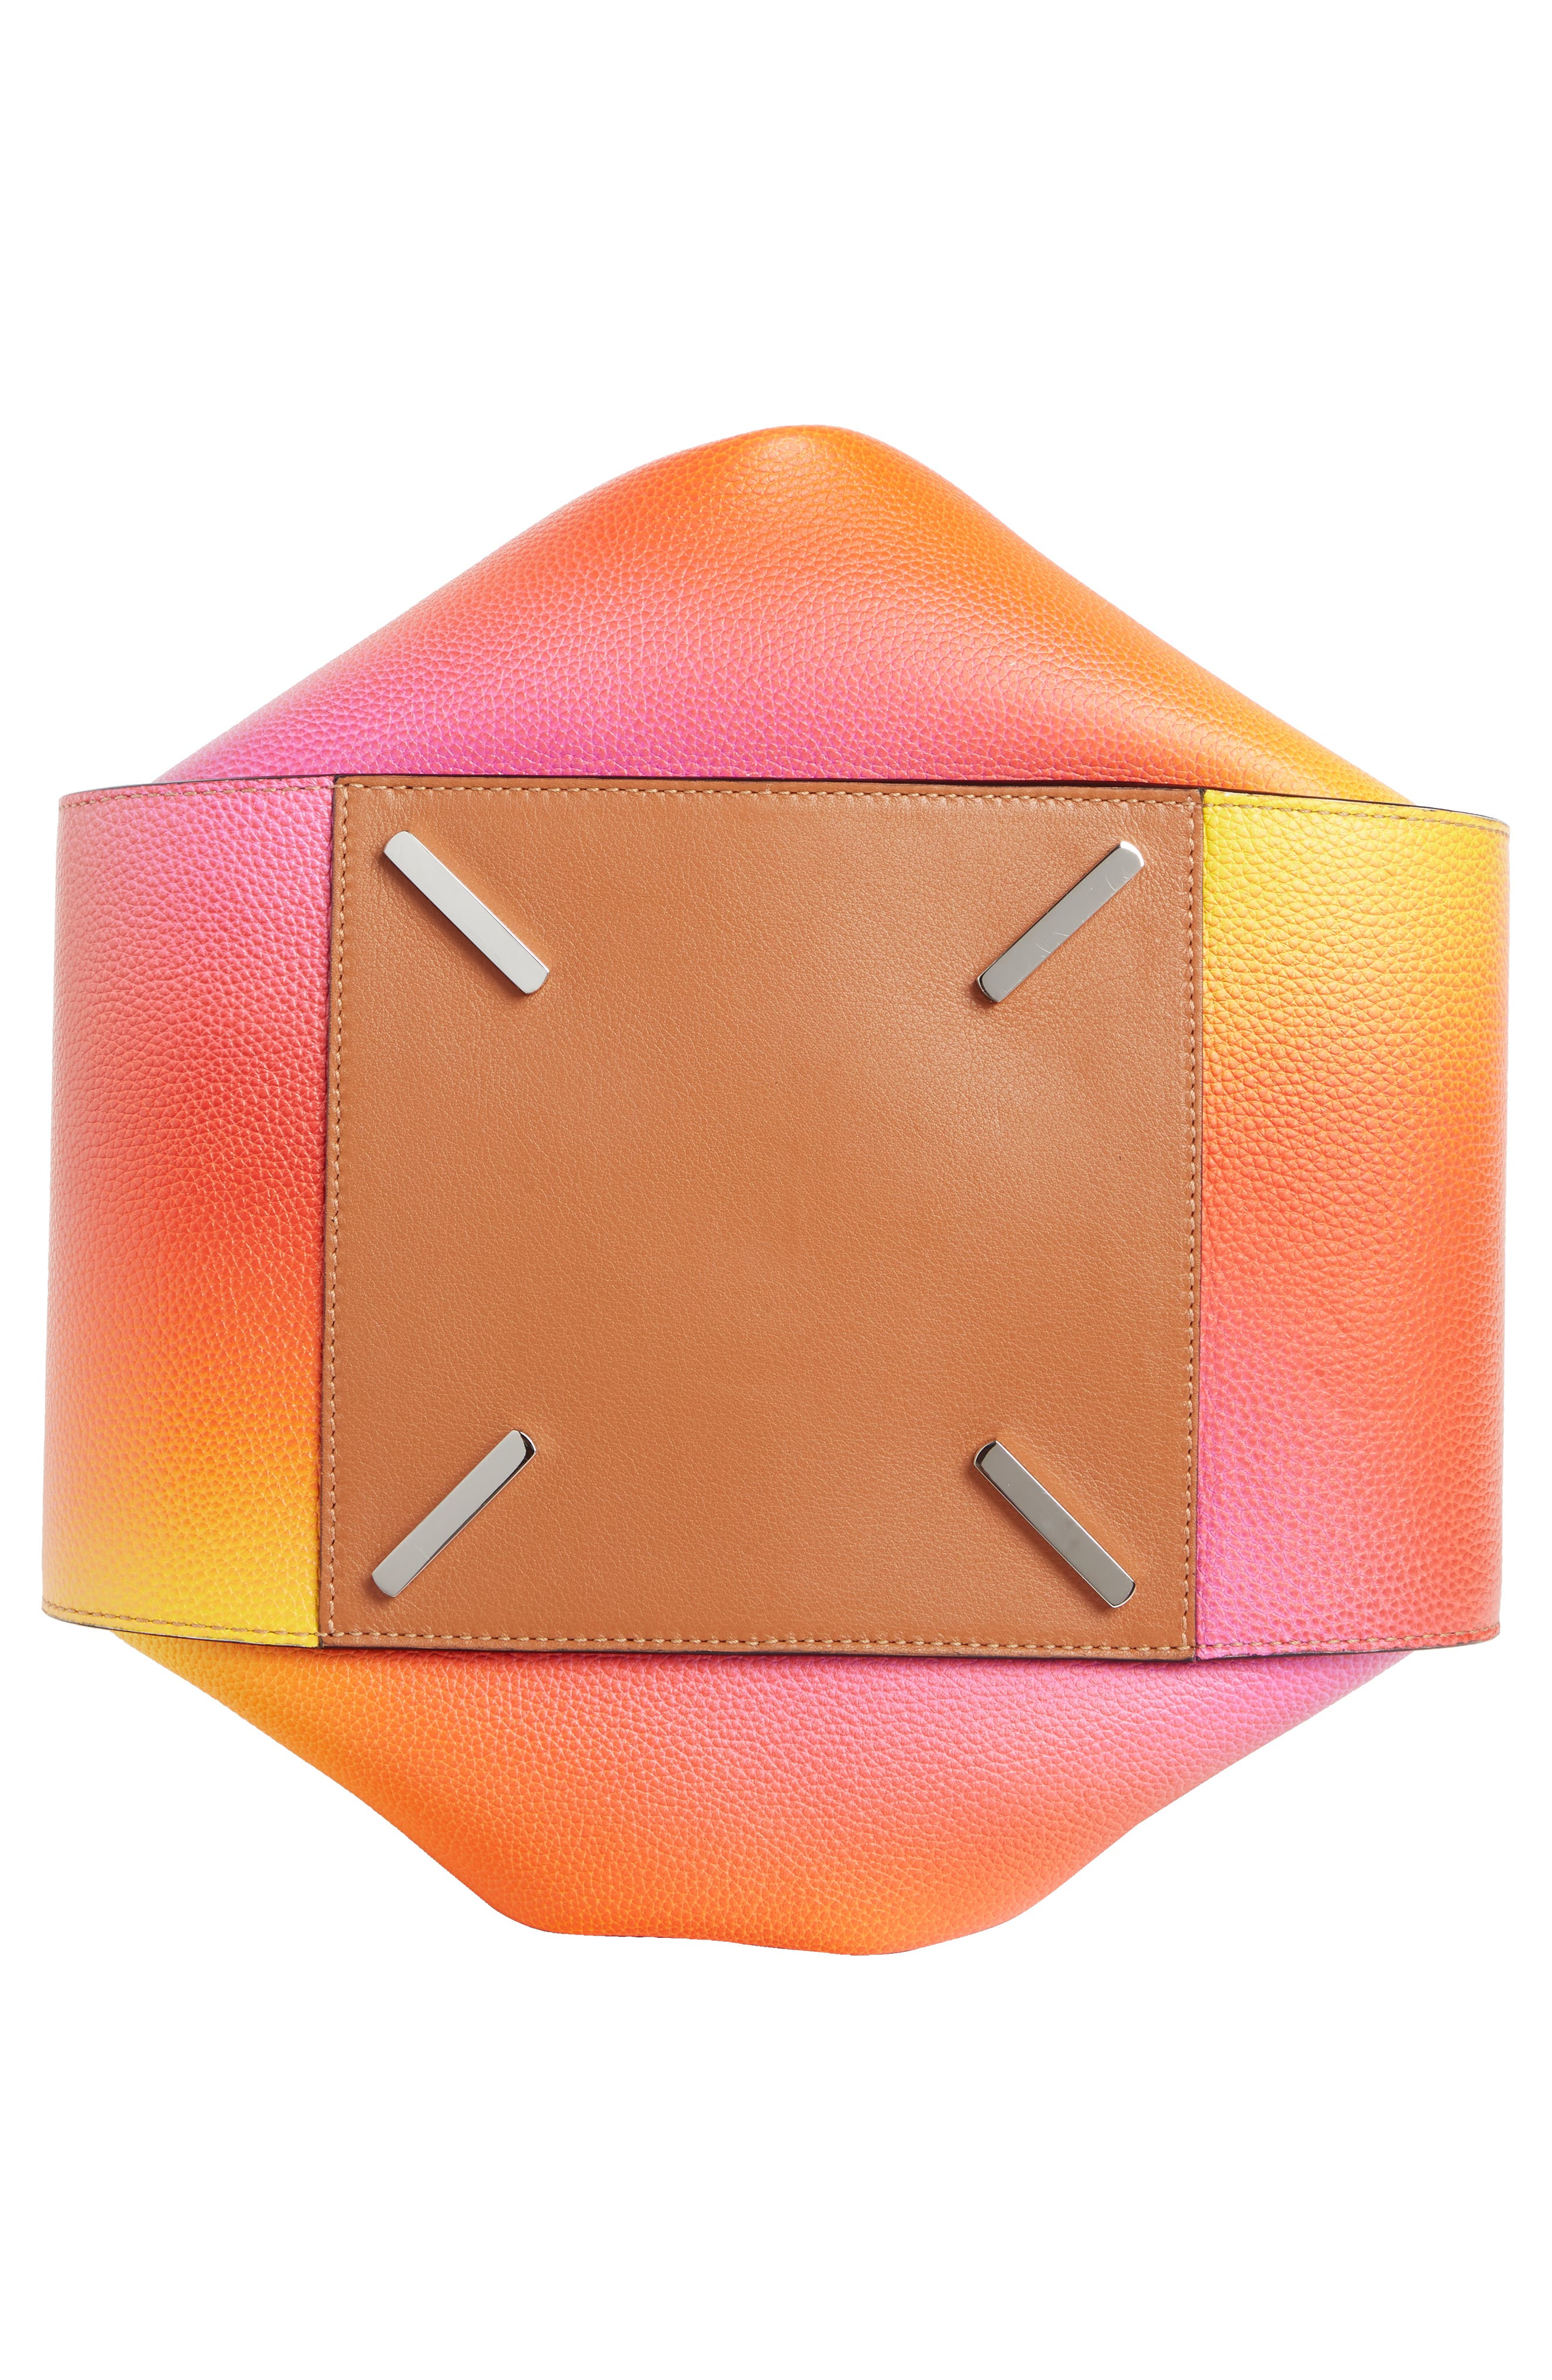 LOEWE, Medium Ombré Leather Hobo, Alternate thumbnail 5, color, ORANGE SUNSET